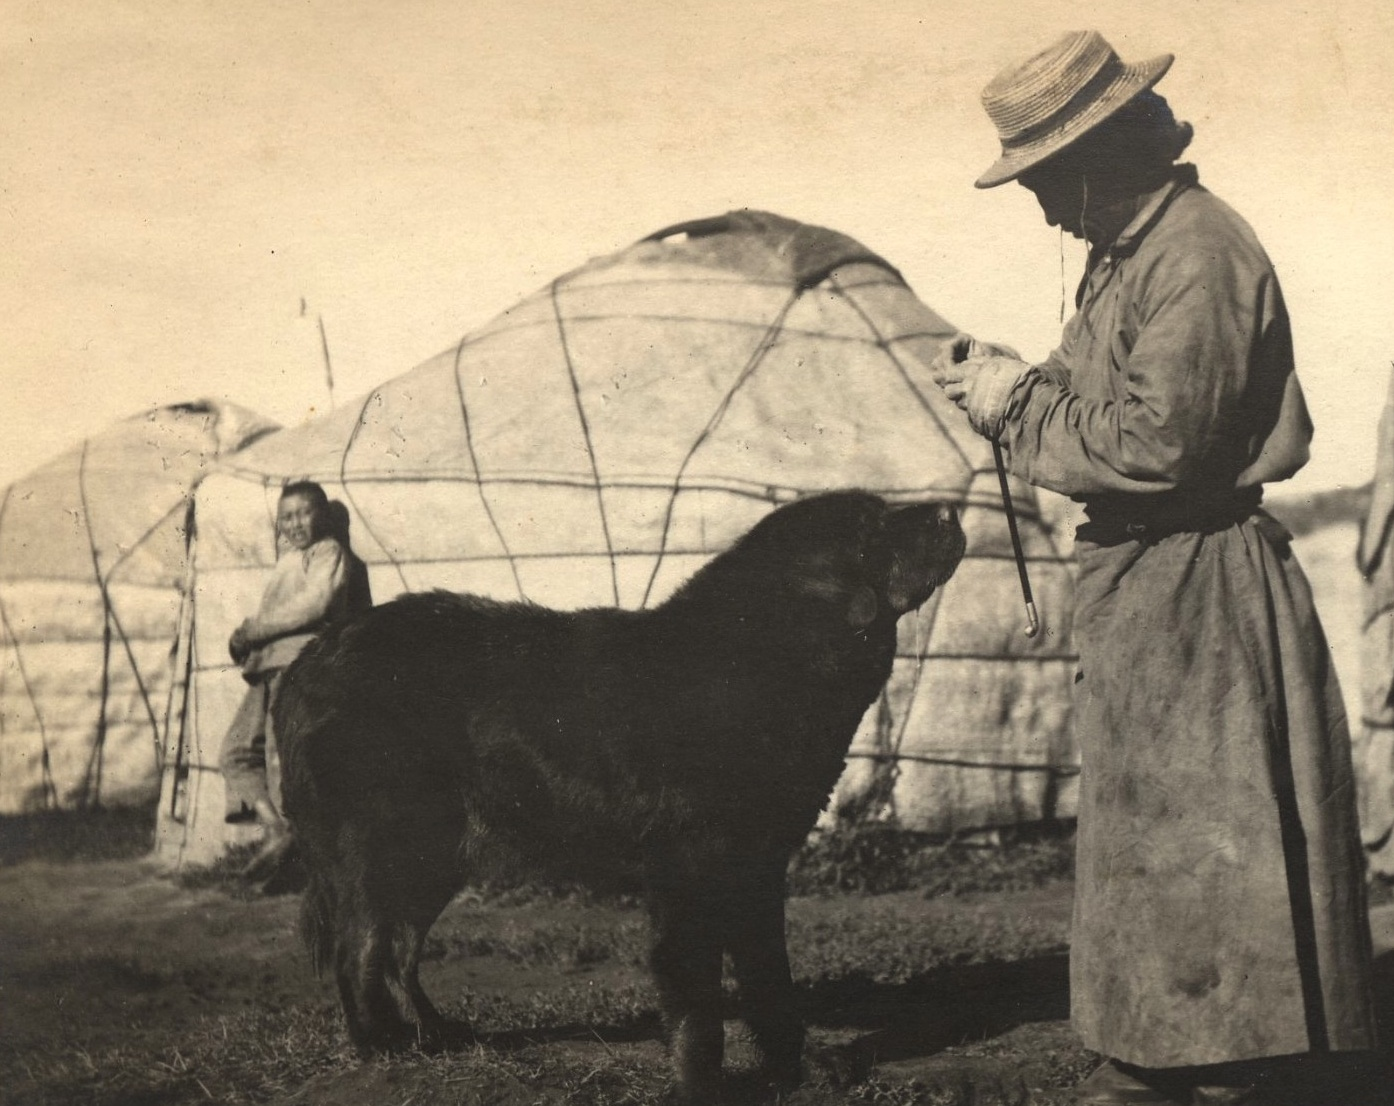 Mongolia+1910+1+crop.jpg